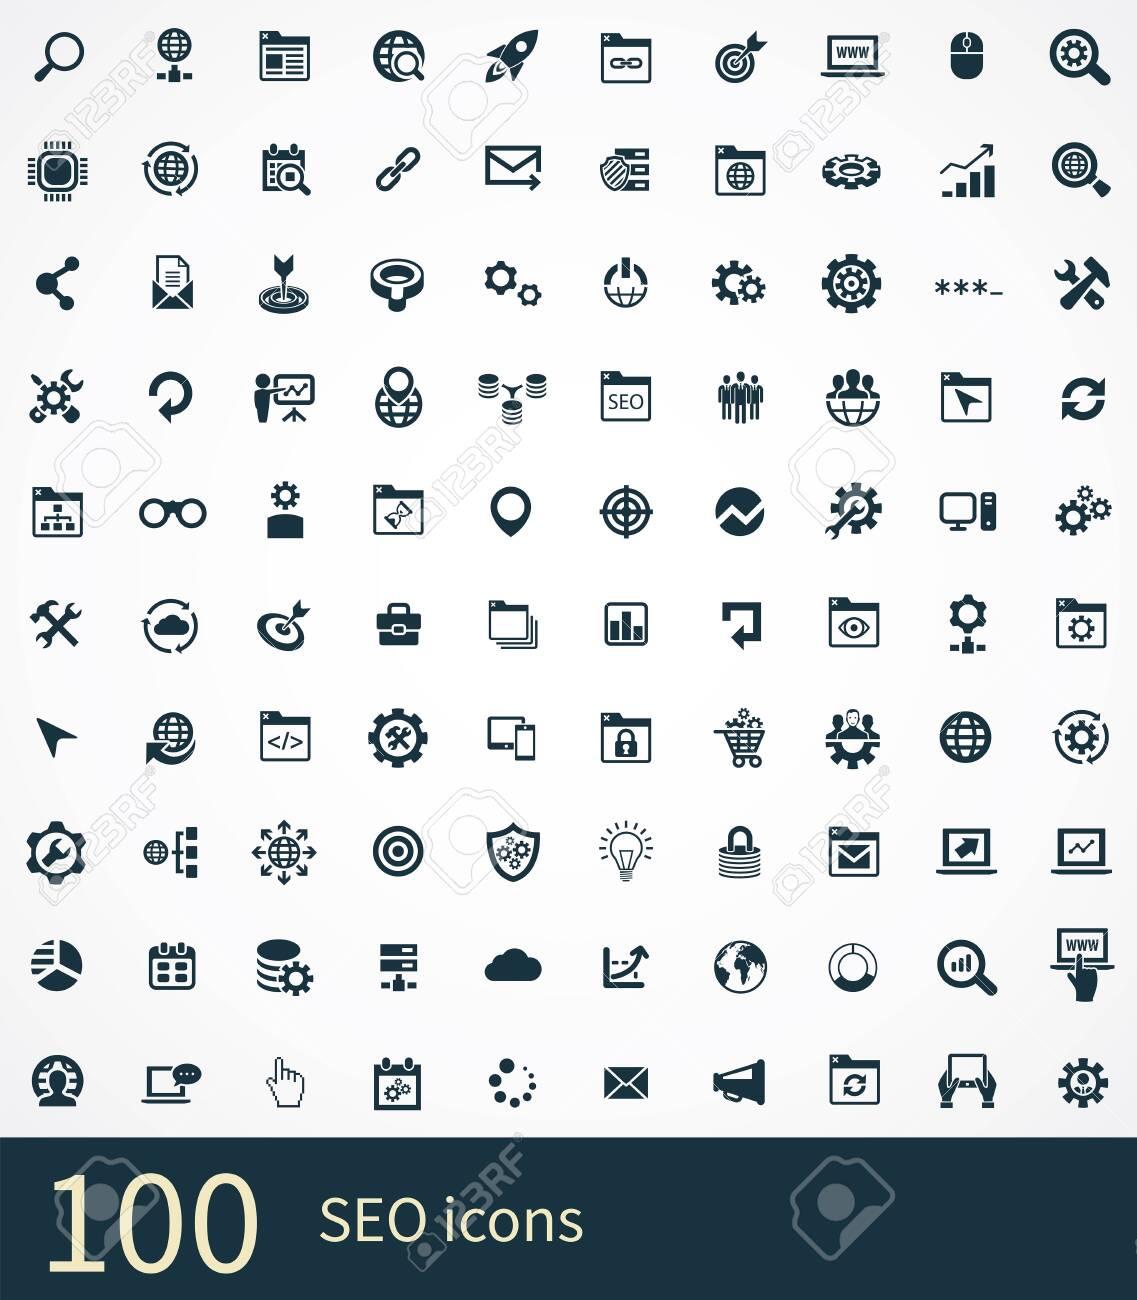 seo 100 icons universal set for web and UI. - 130777424